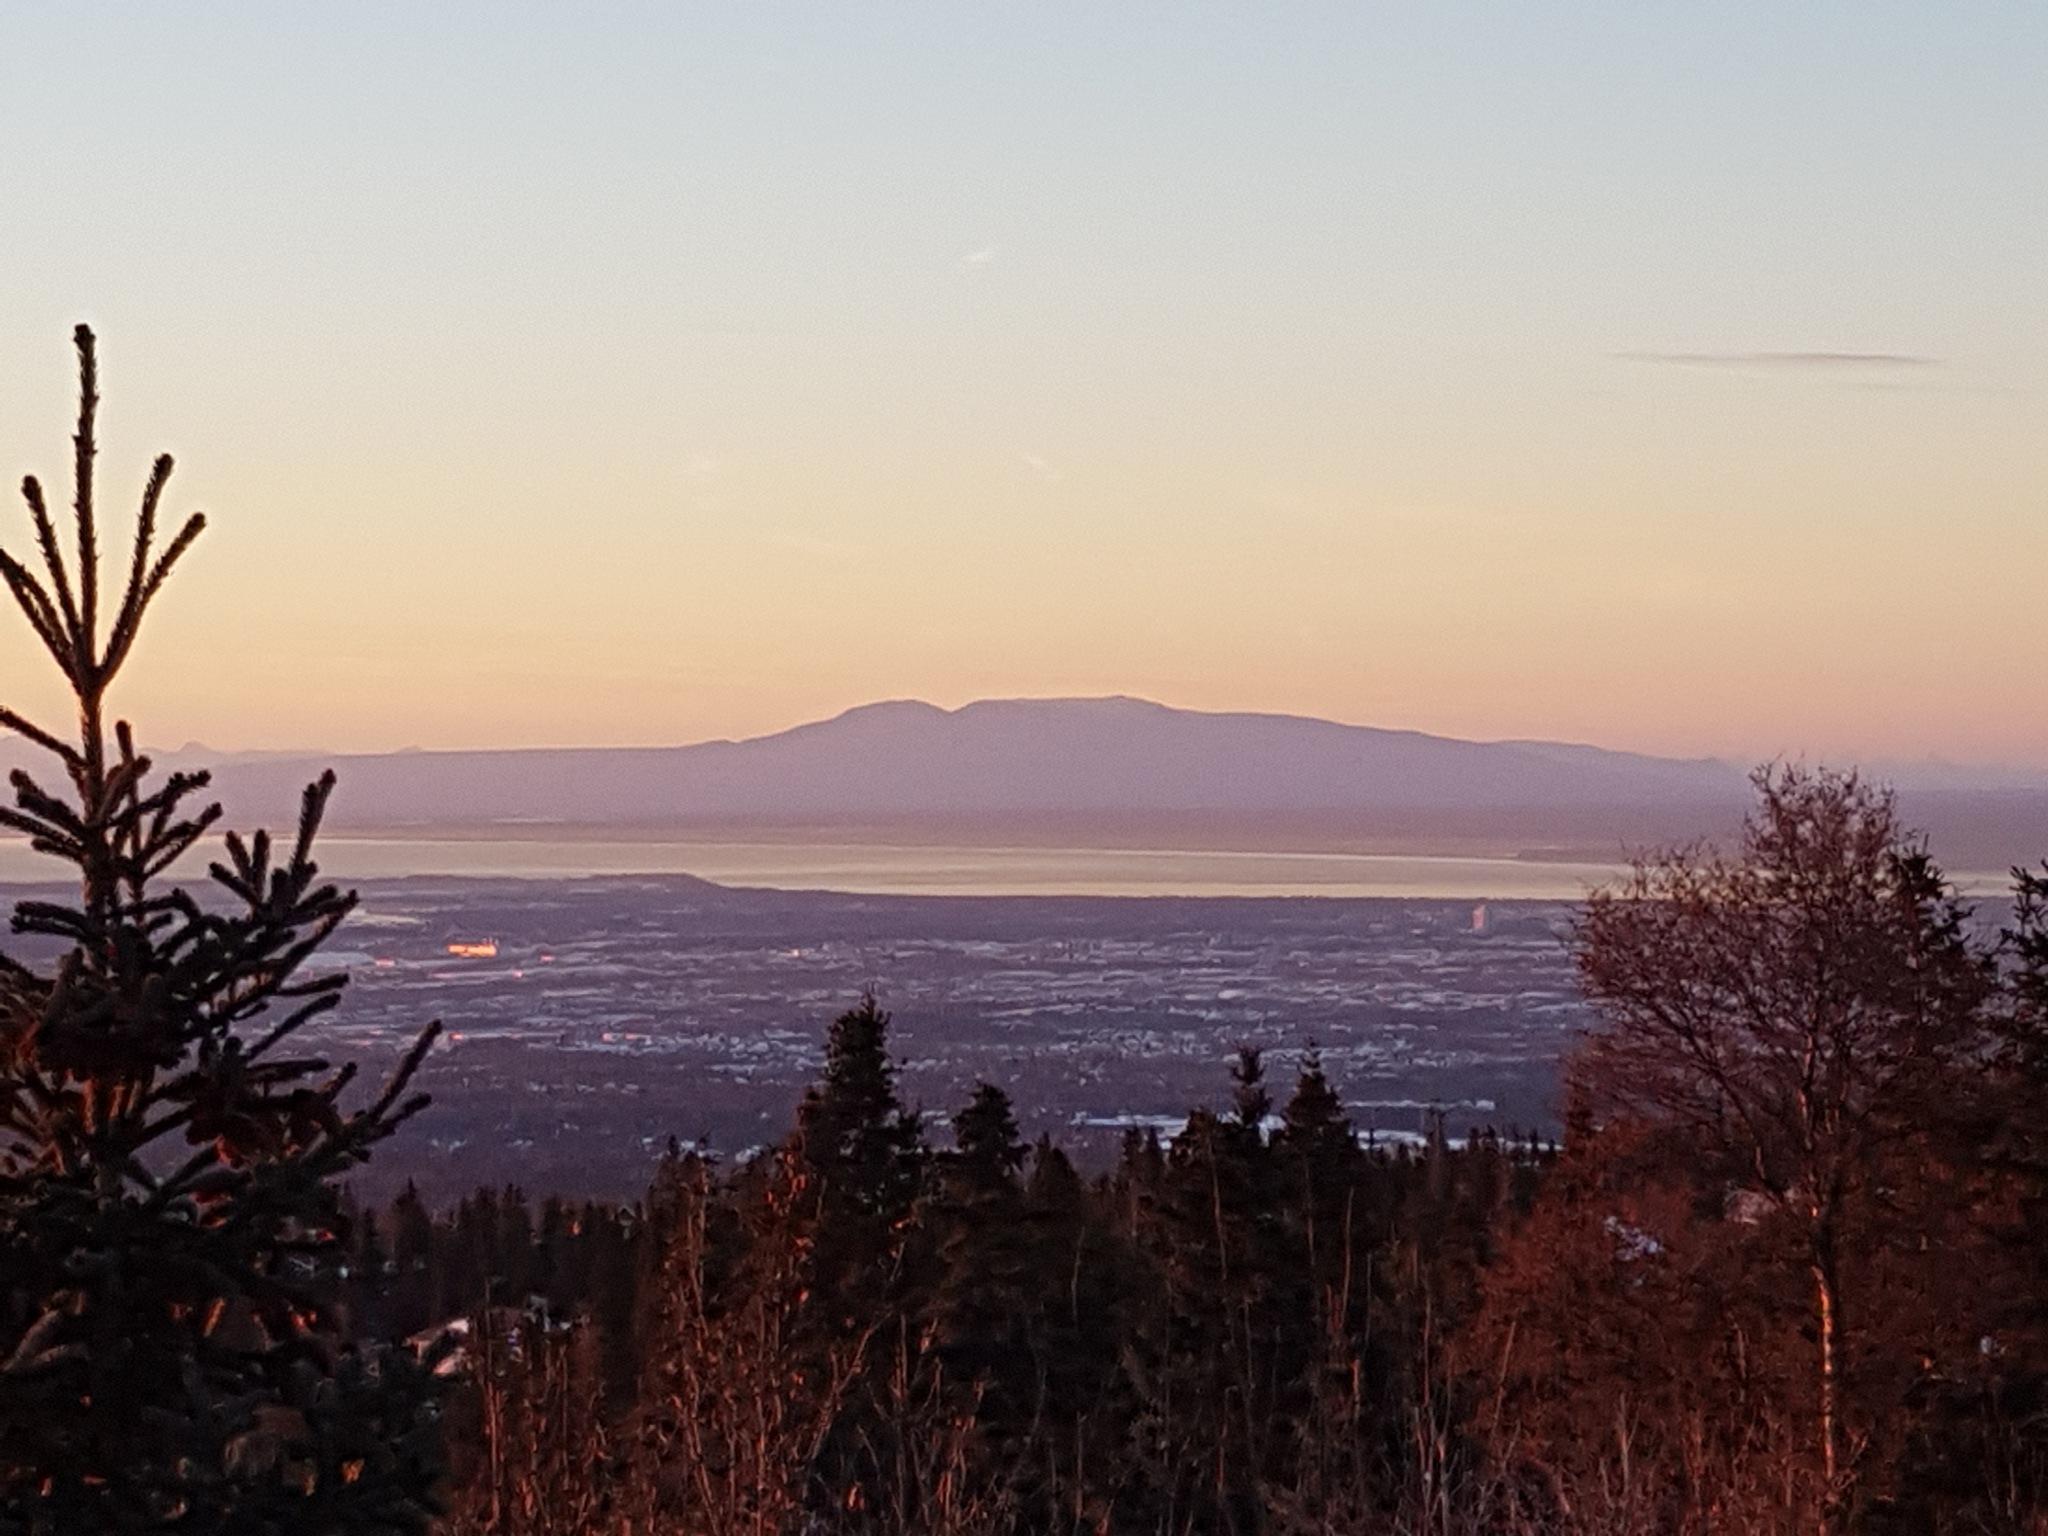 Lavender Mt. Susitna Sunset by teresa.thiele1